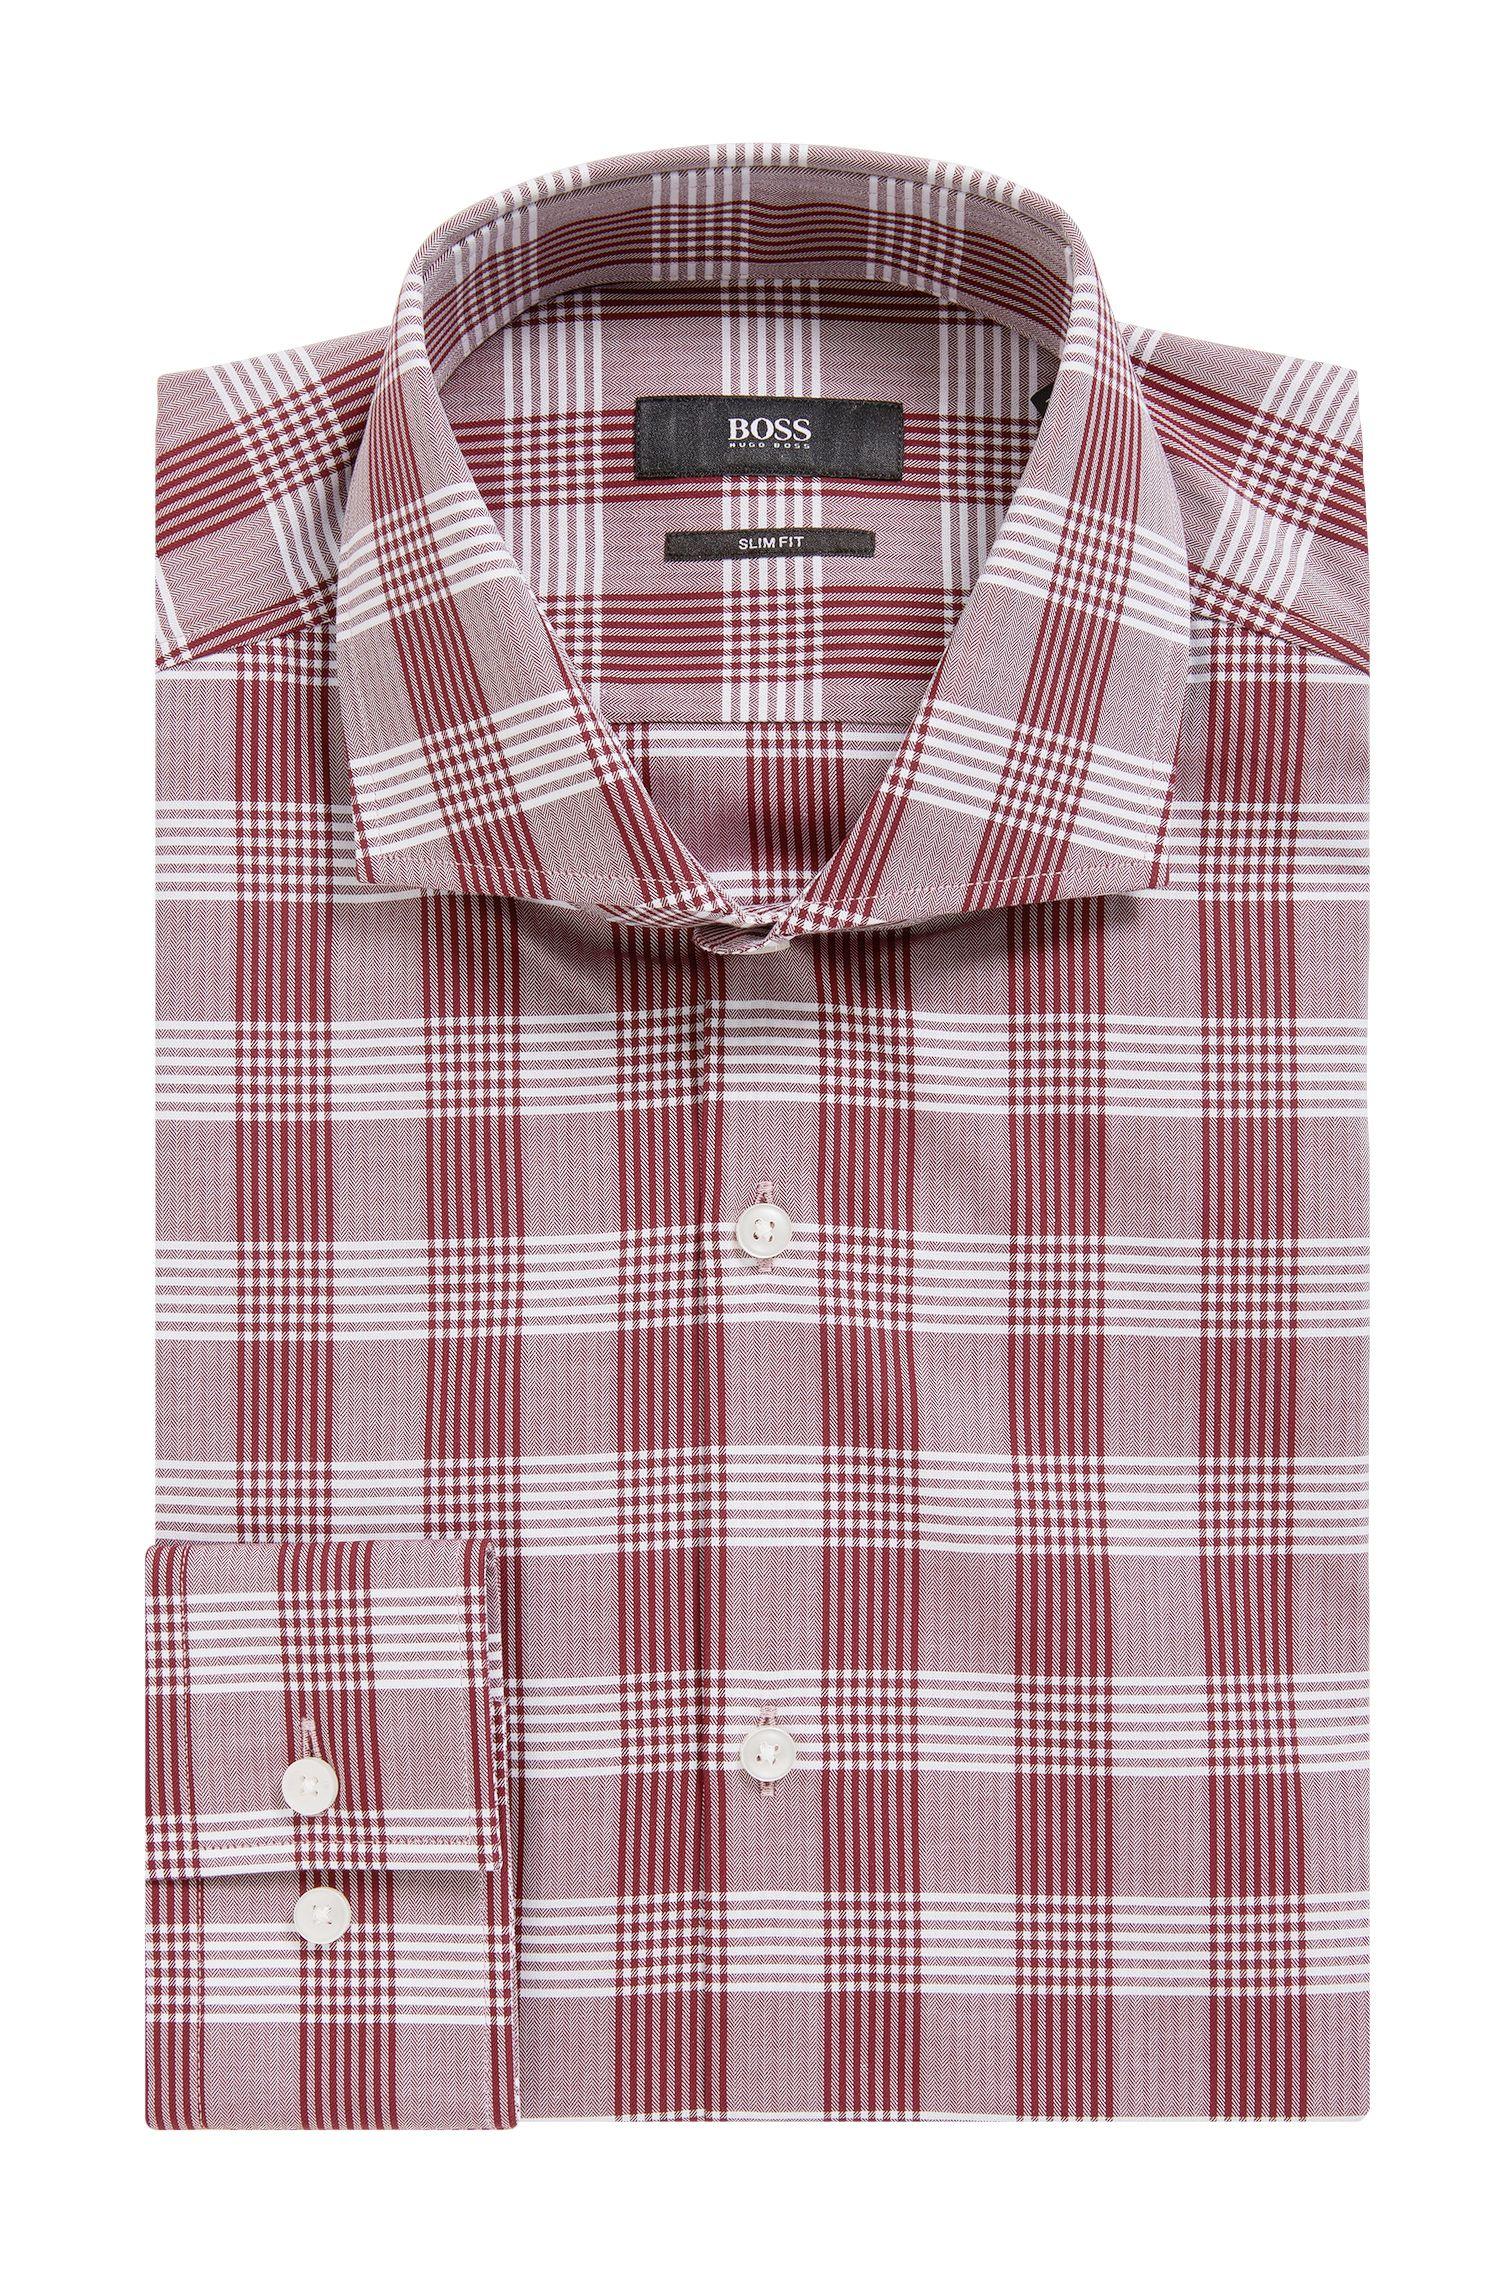 Herringbone Check Cotton Dress Shirt, Slim Fit | Jason